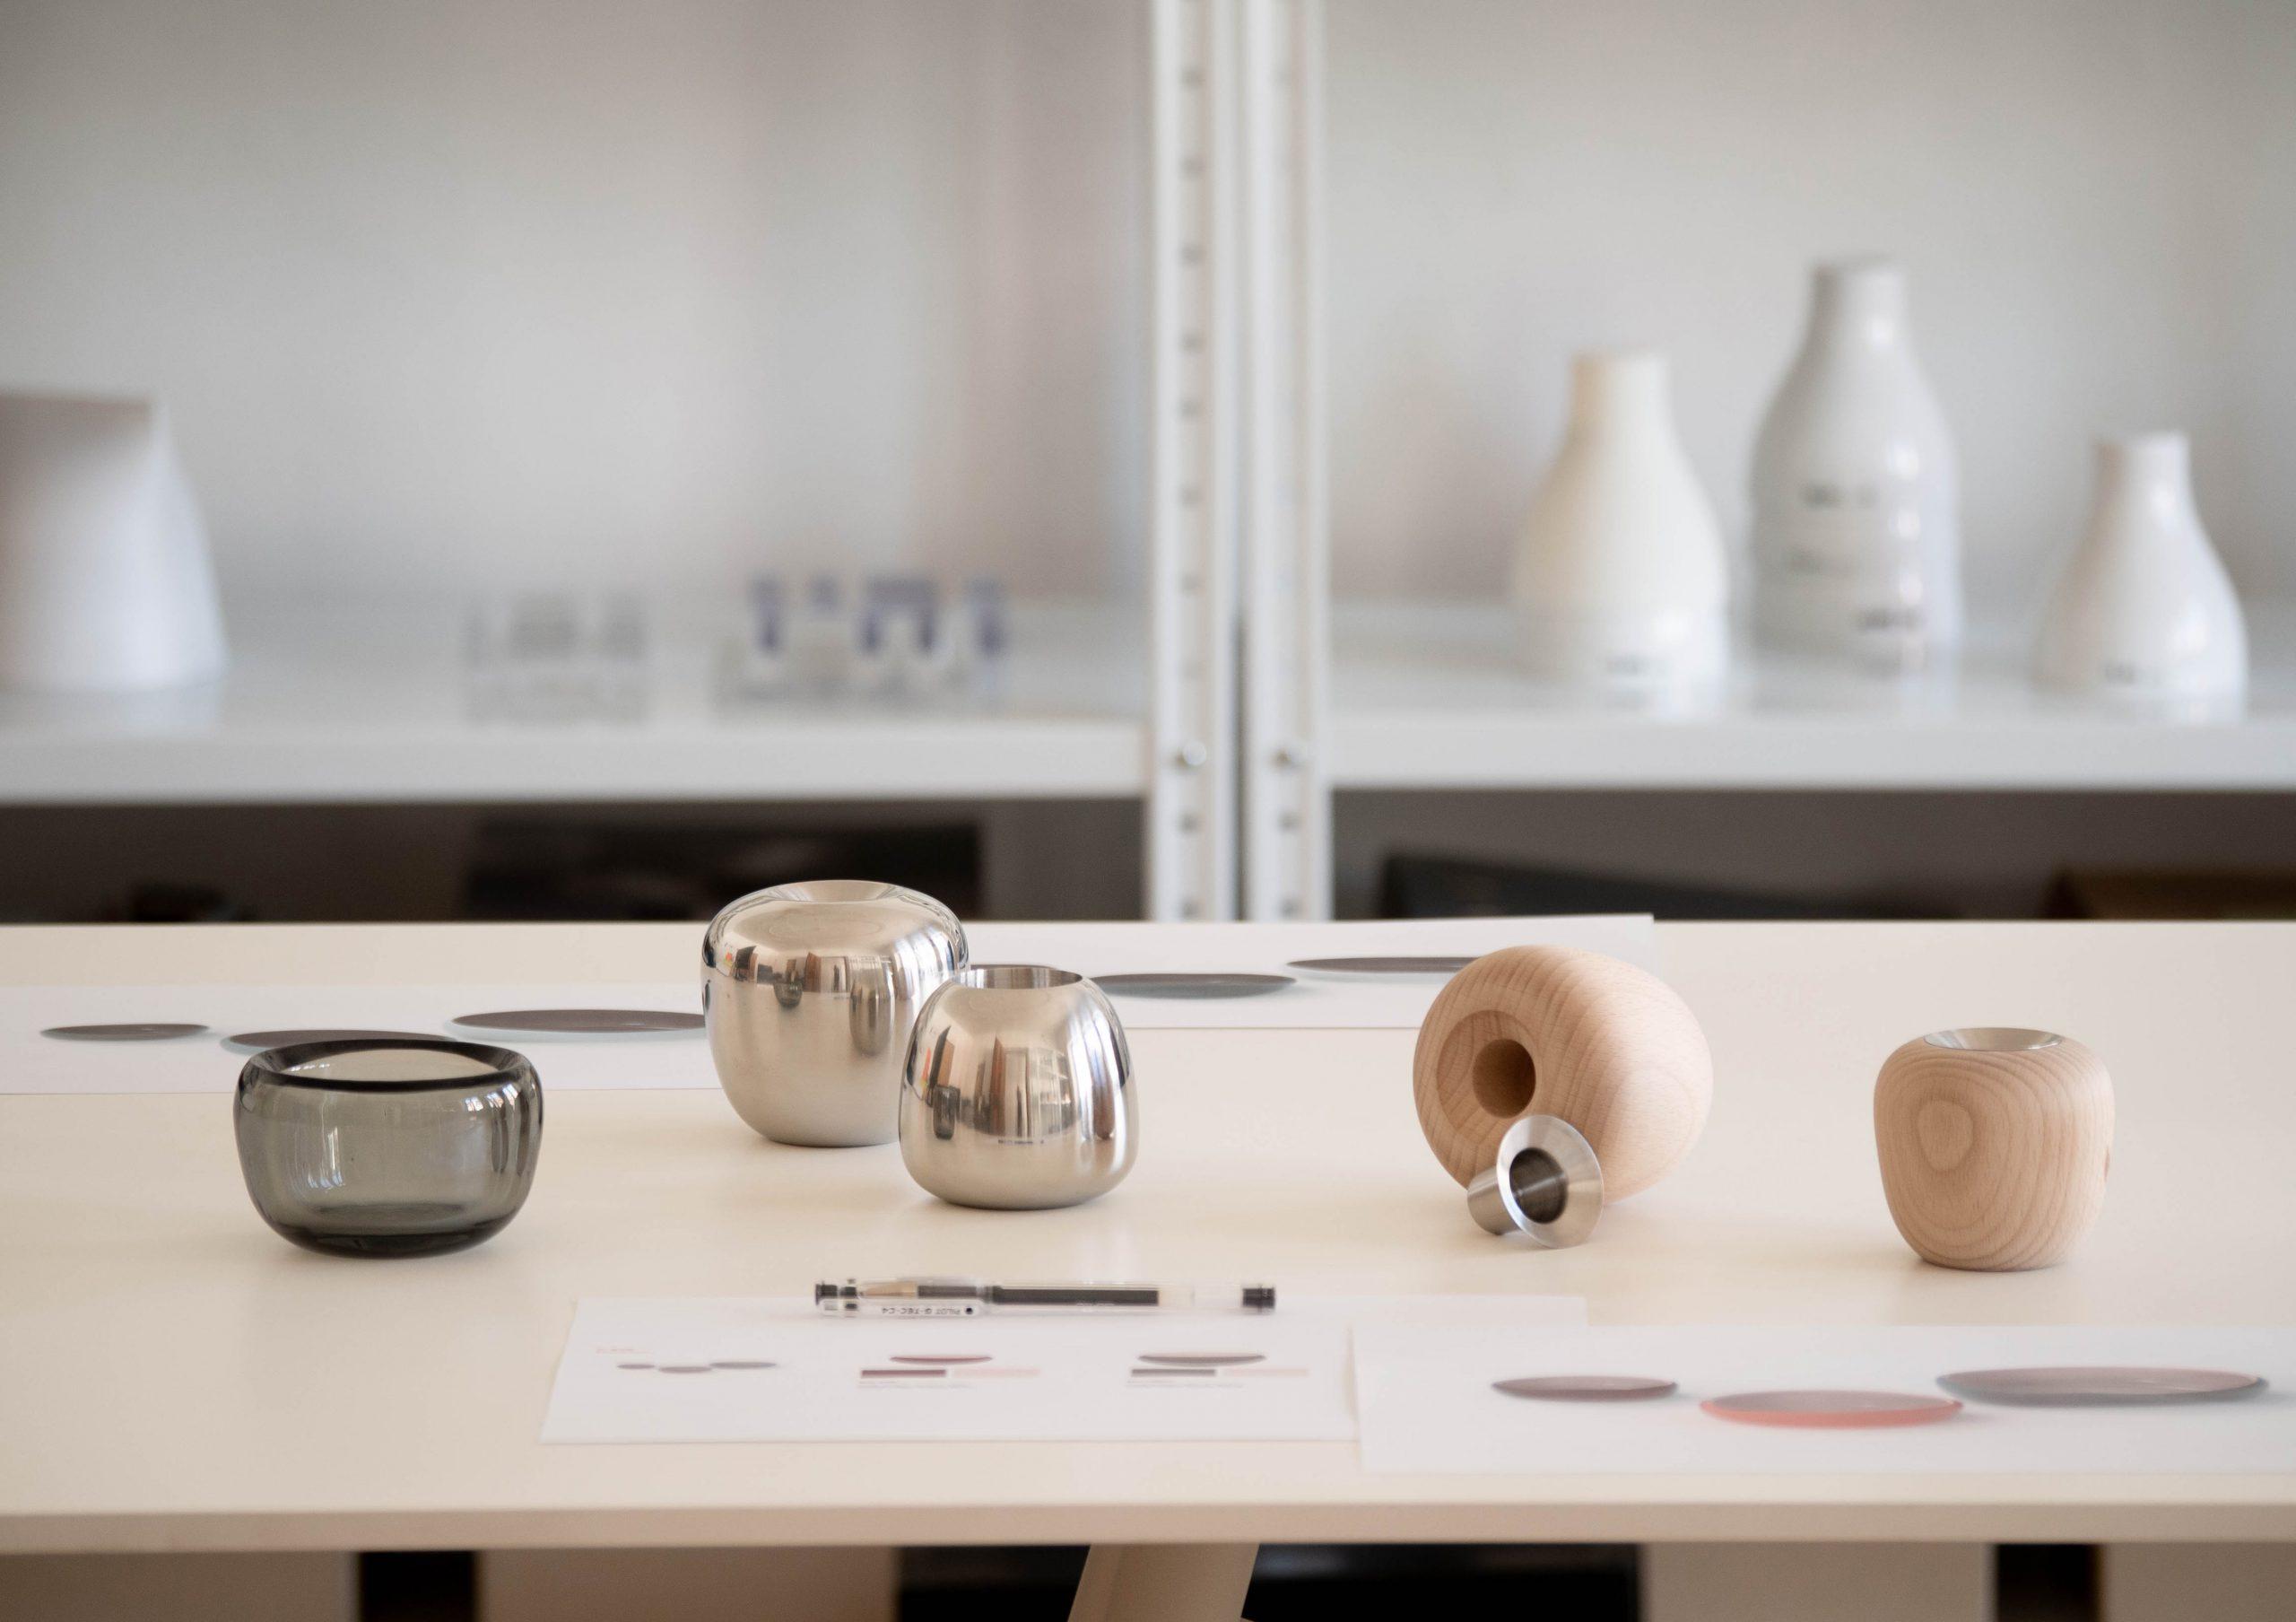 Ora candle holders studio shot by Debiasi Sandri for Stelton